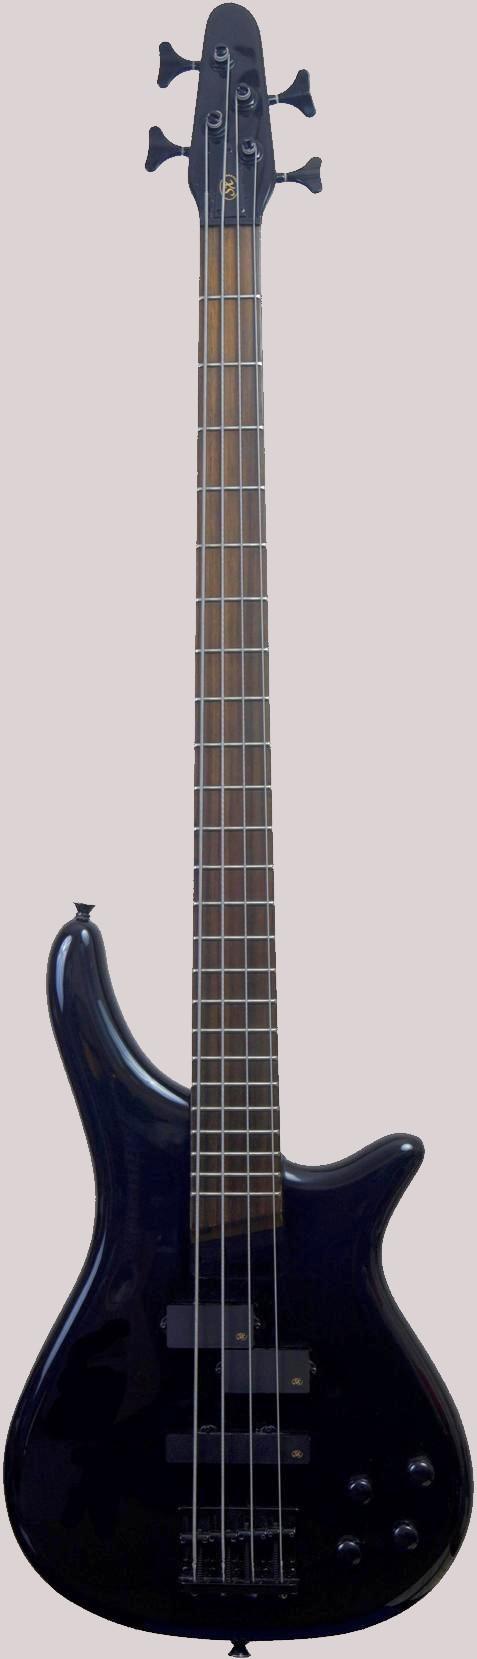 S.X. SB301 active Bass